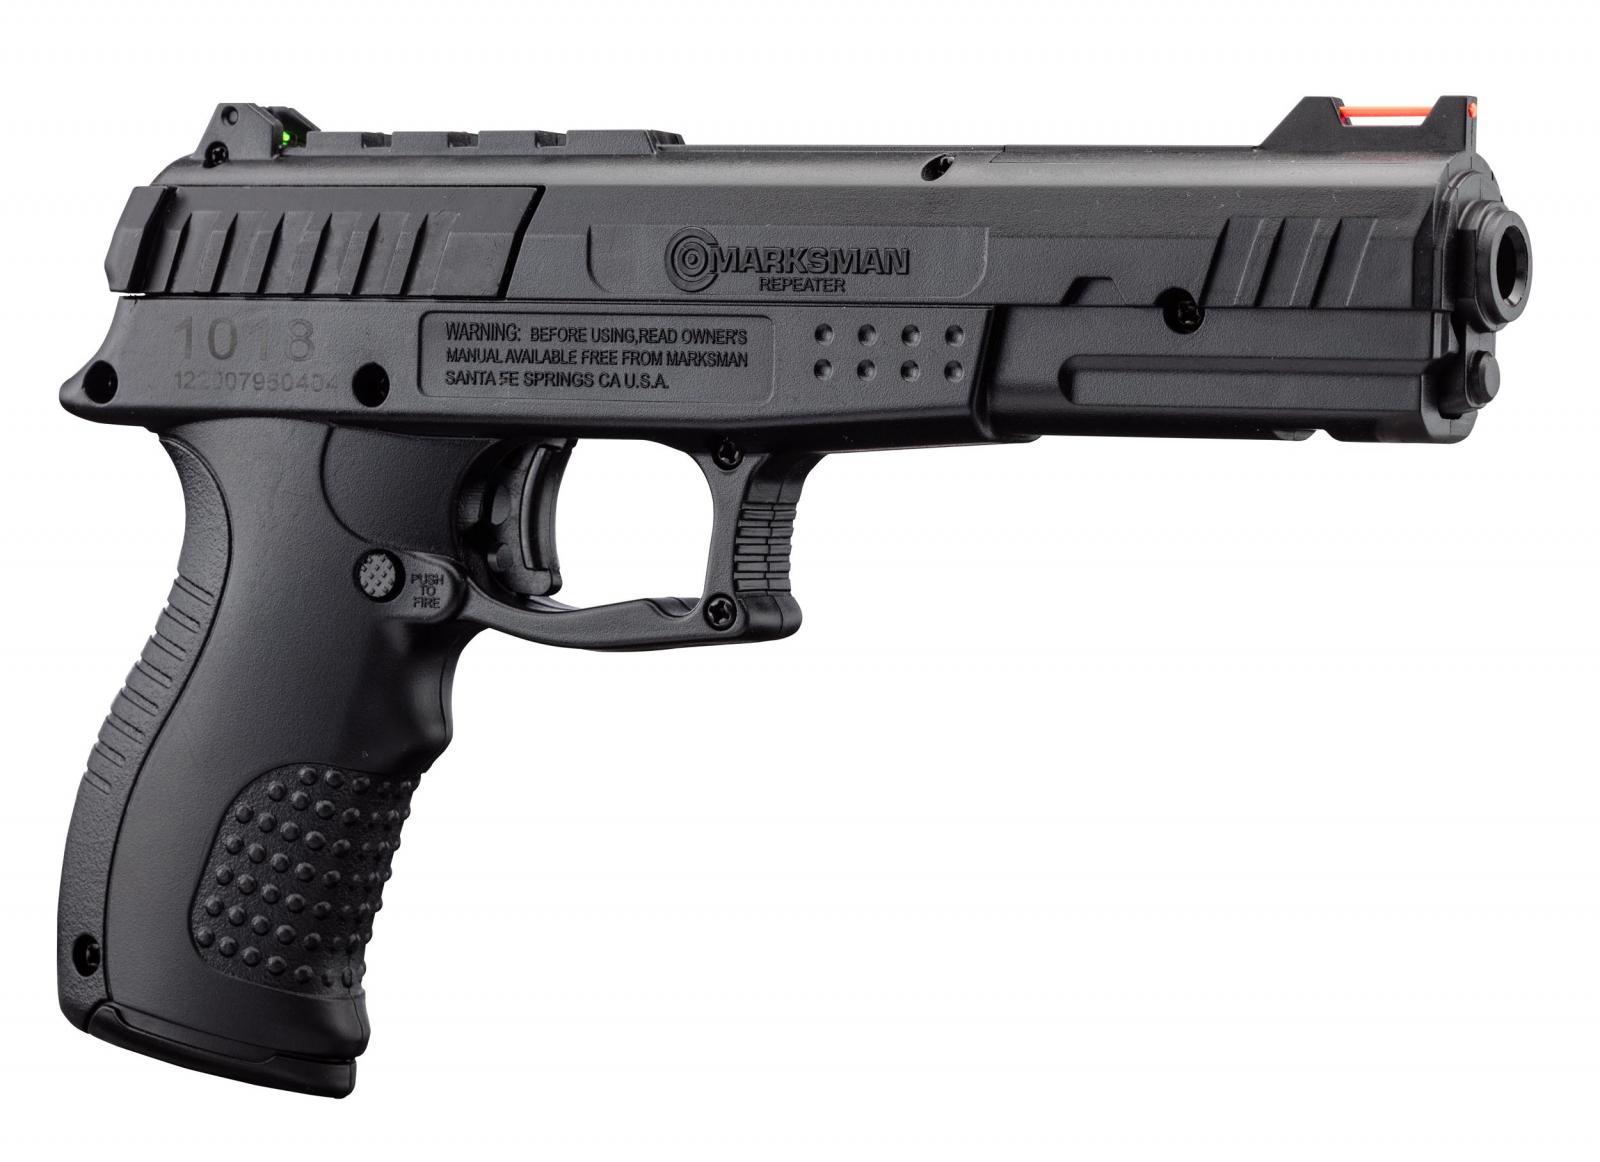 Pistolet à air compriméé BEEMAN Maksman 1018 cal. 4.5 mm